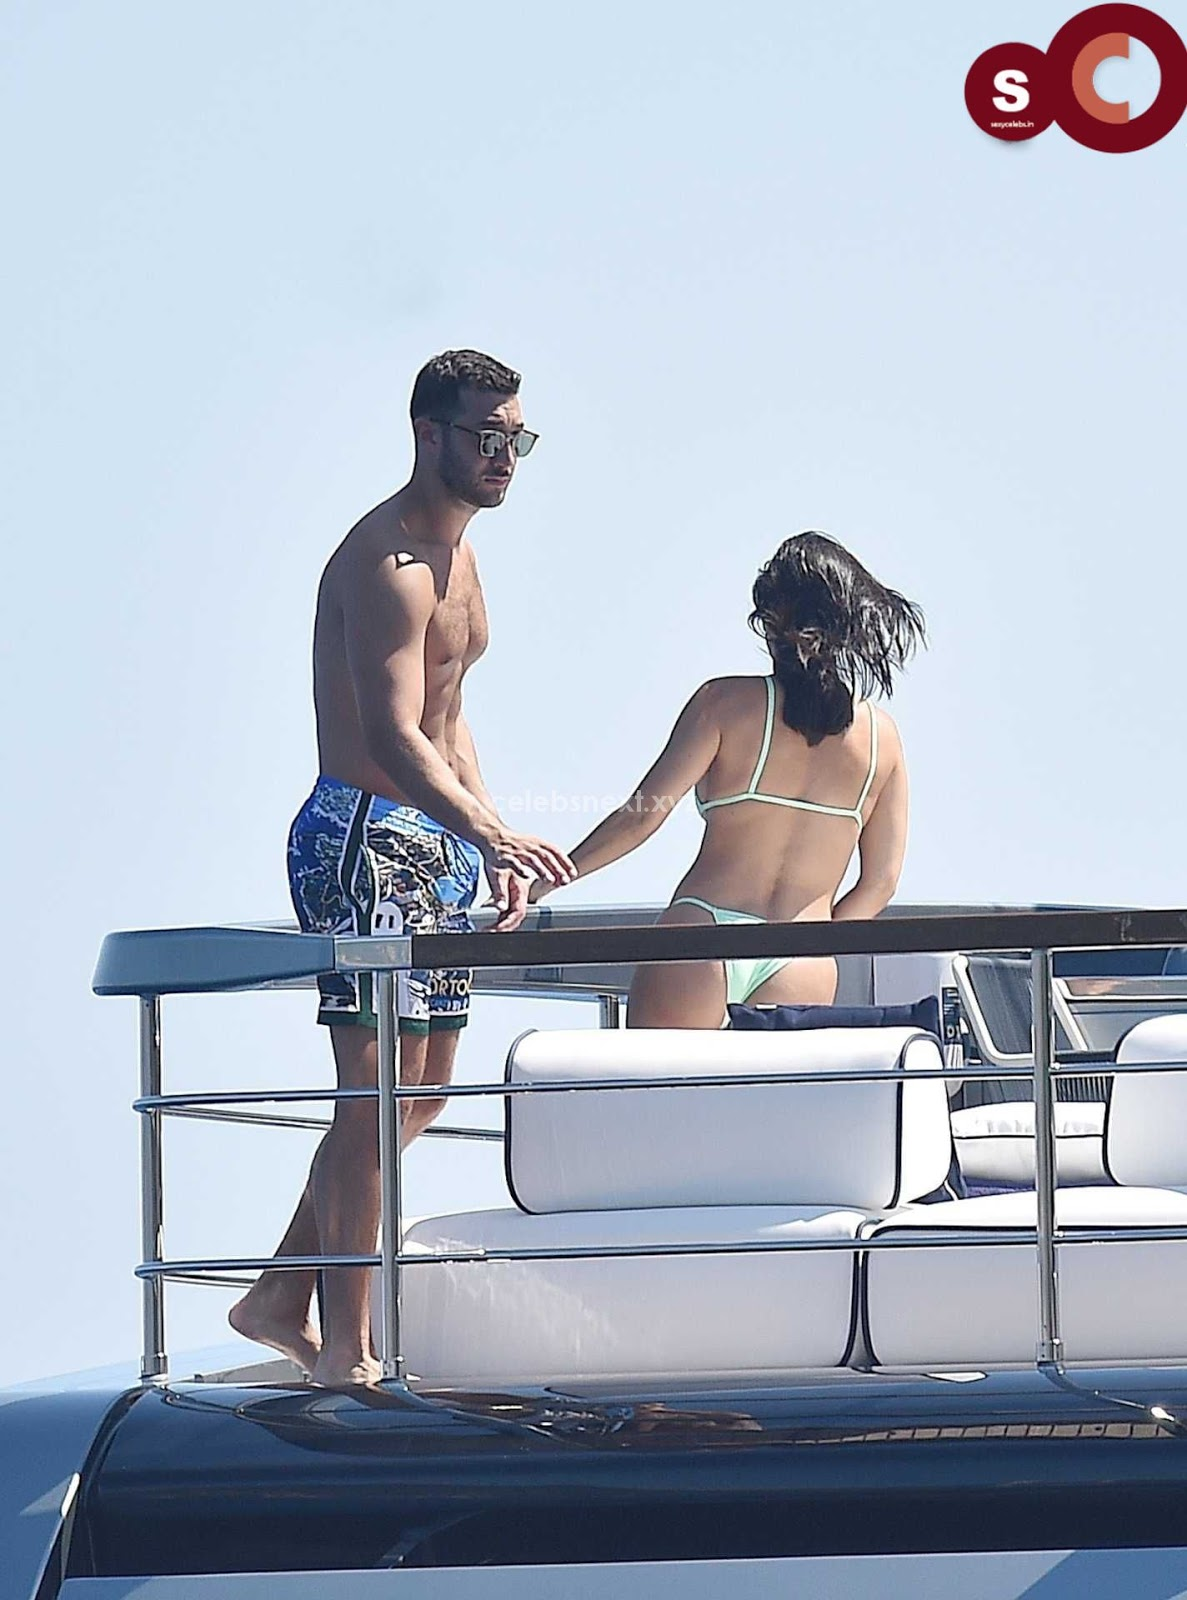 Kourtney Kardashian vin thongs candids Sexy Smooth small Naked Ass July 2018 ~ CelebsNext.xyz Exclusive Celebrity